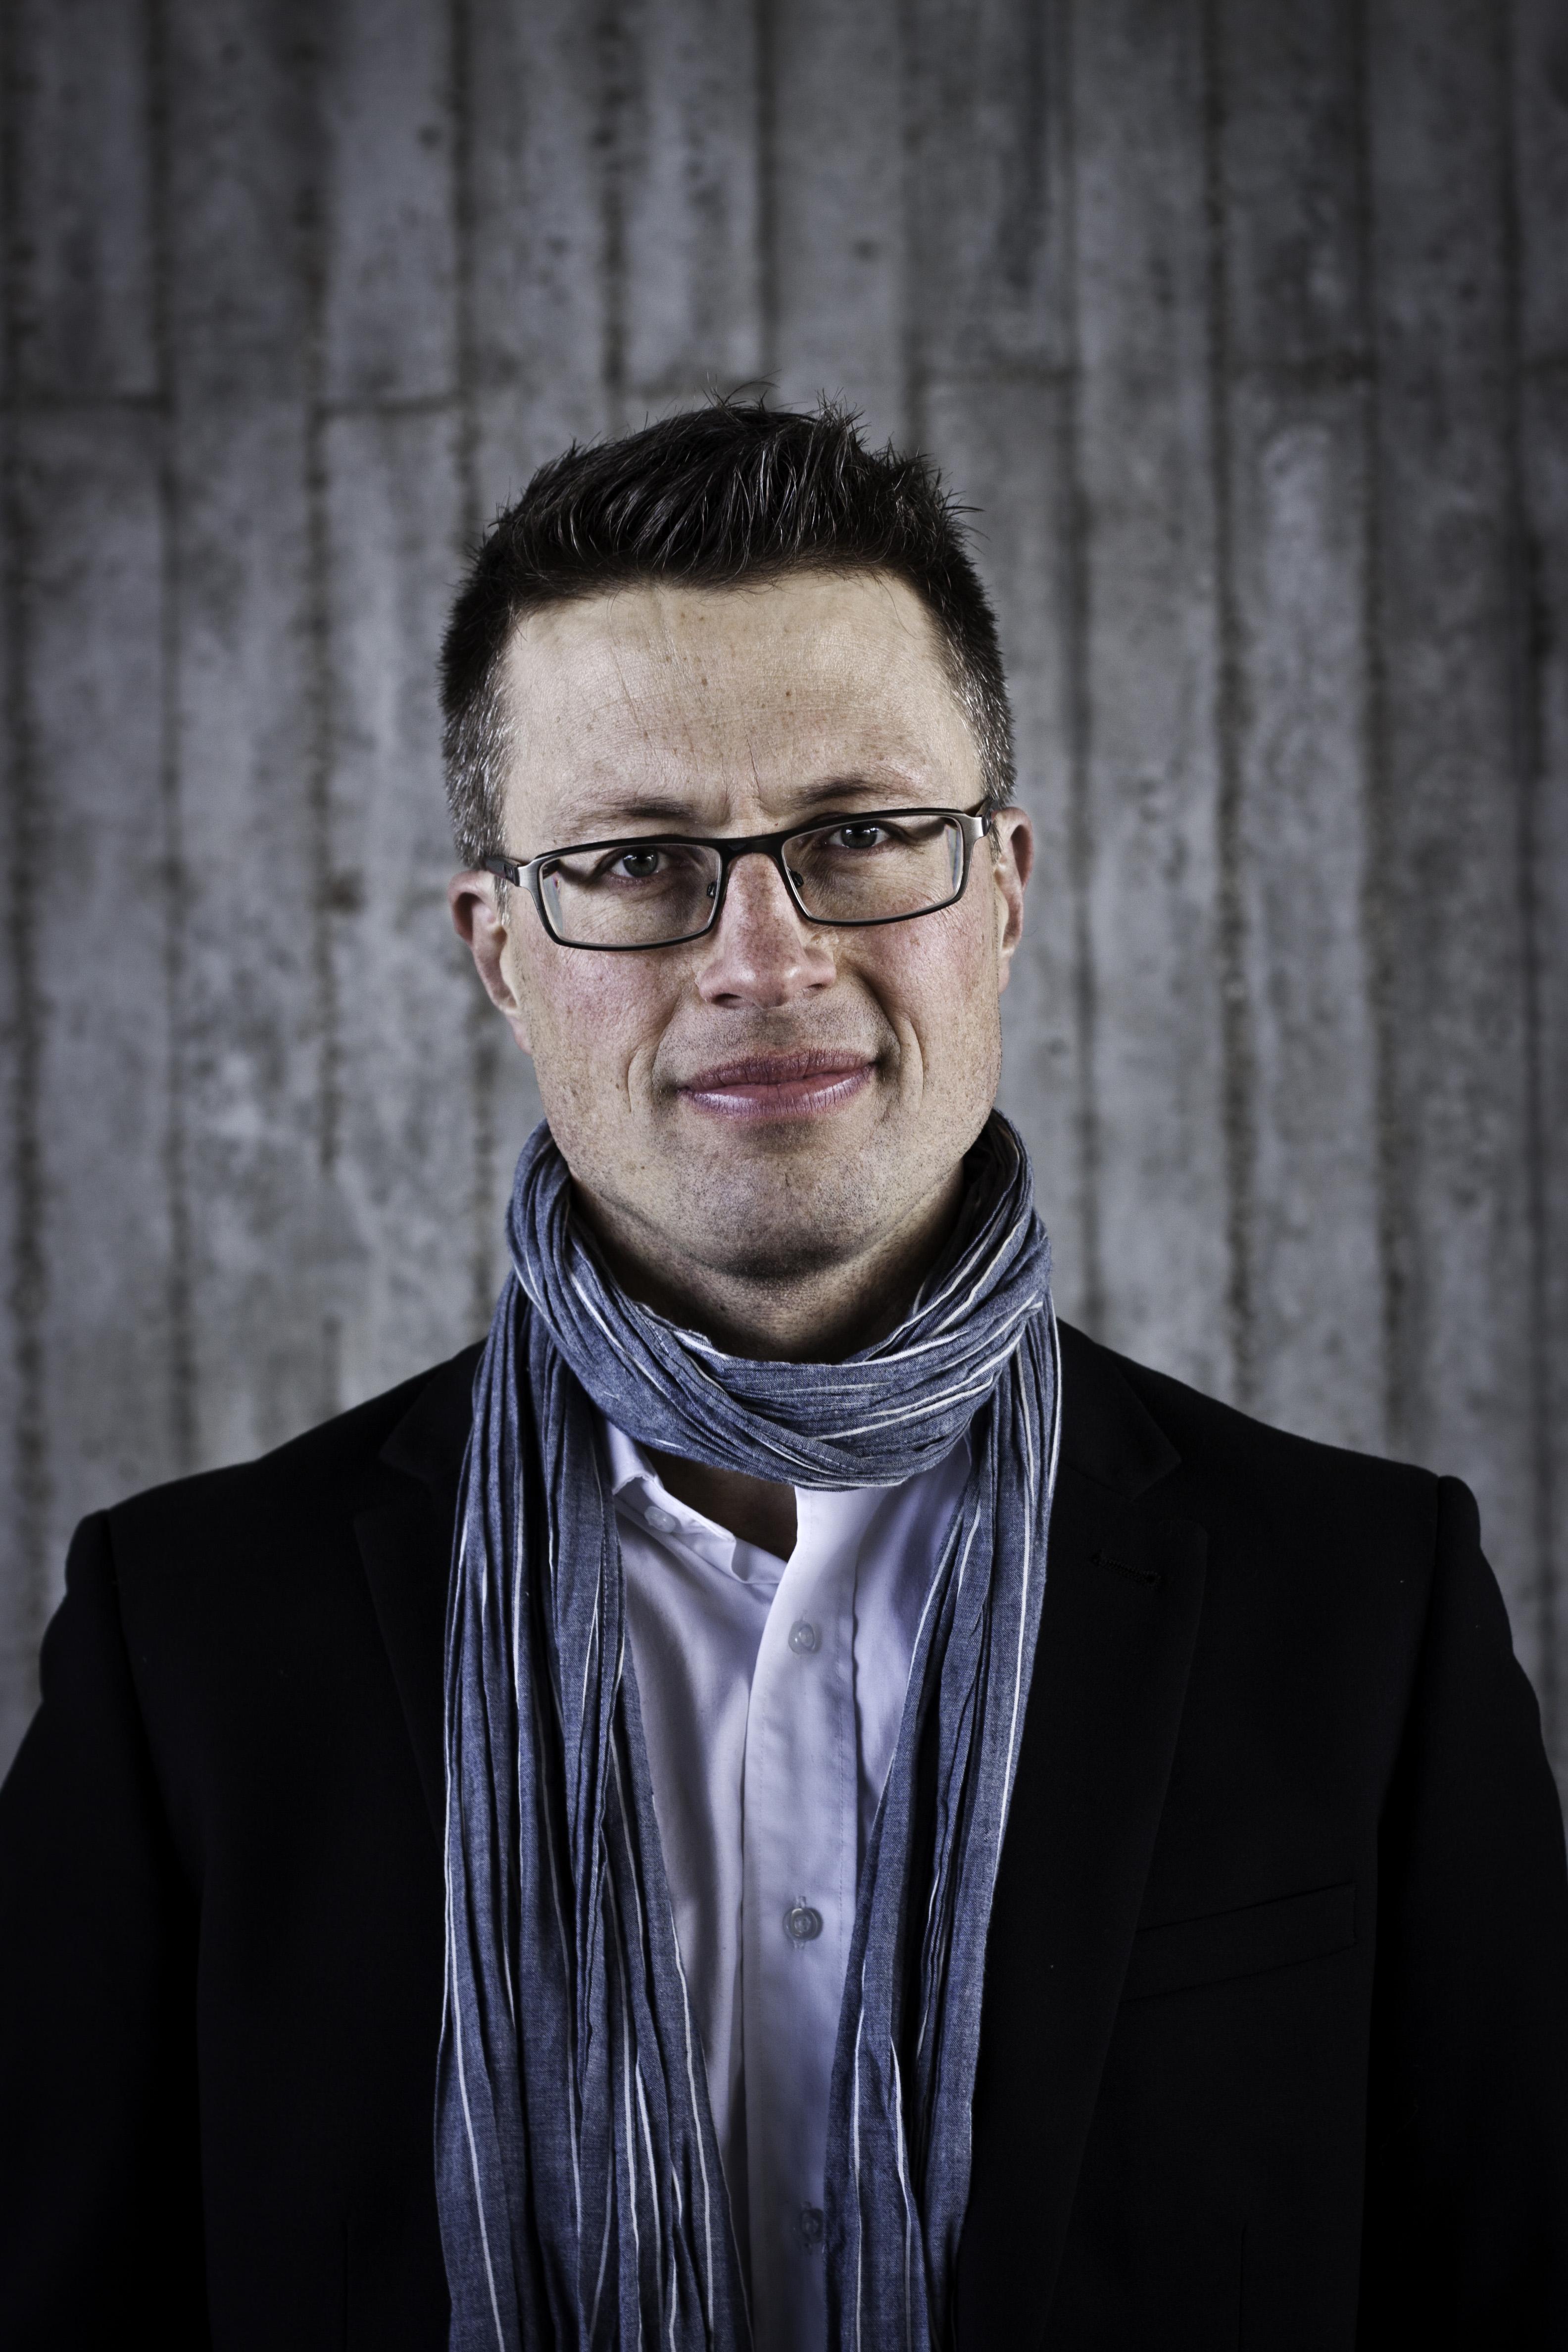 Daniel Hjorth